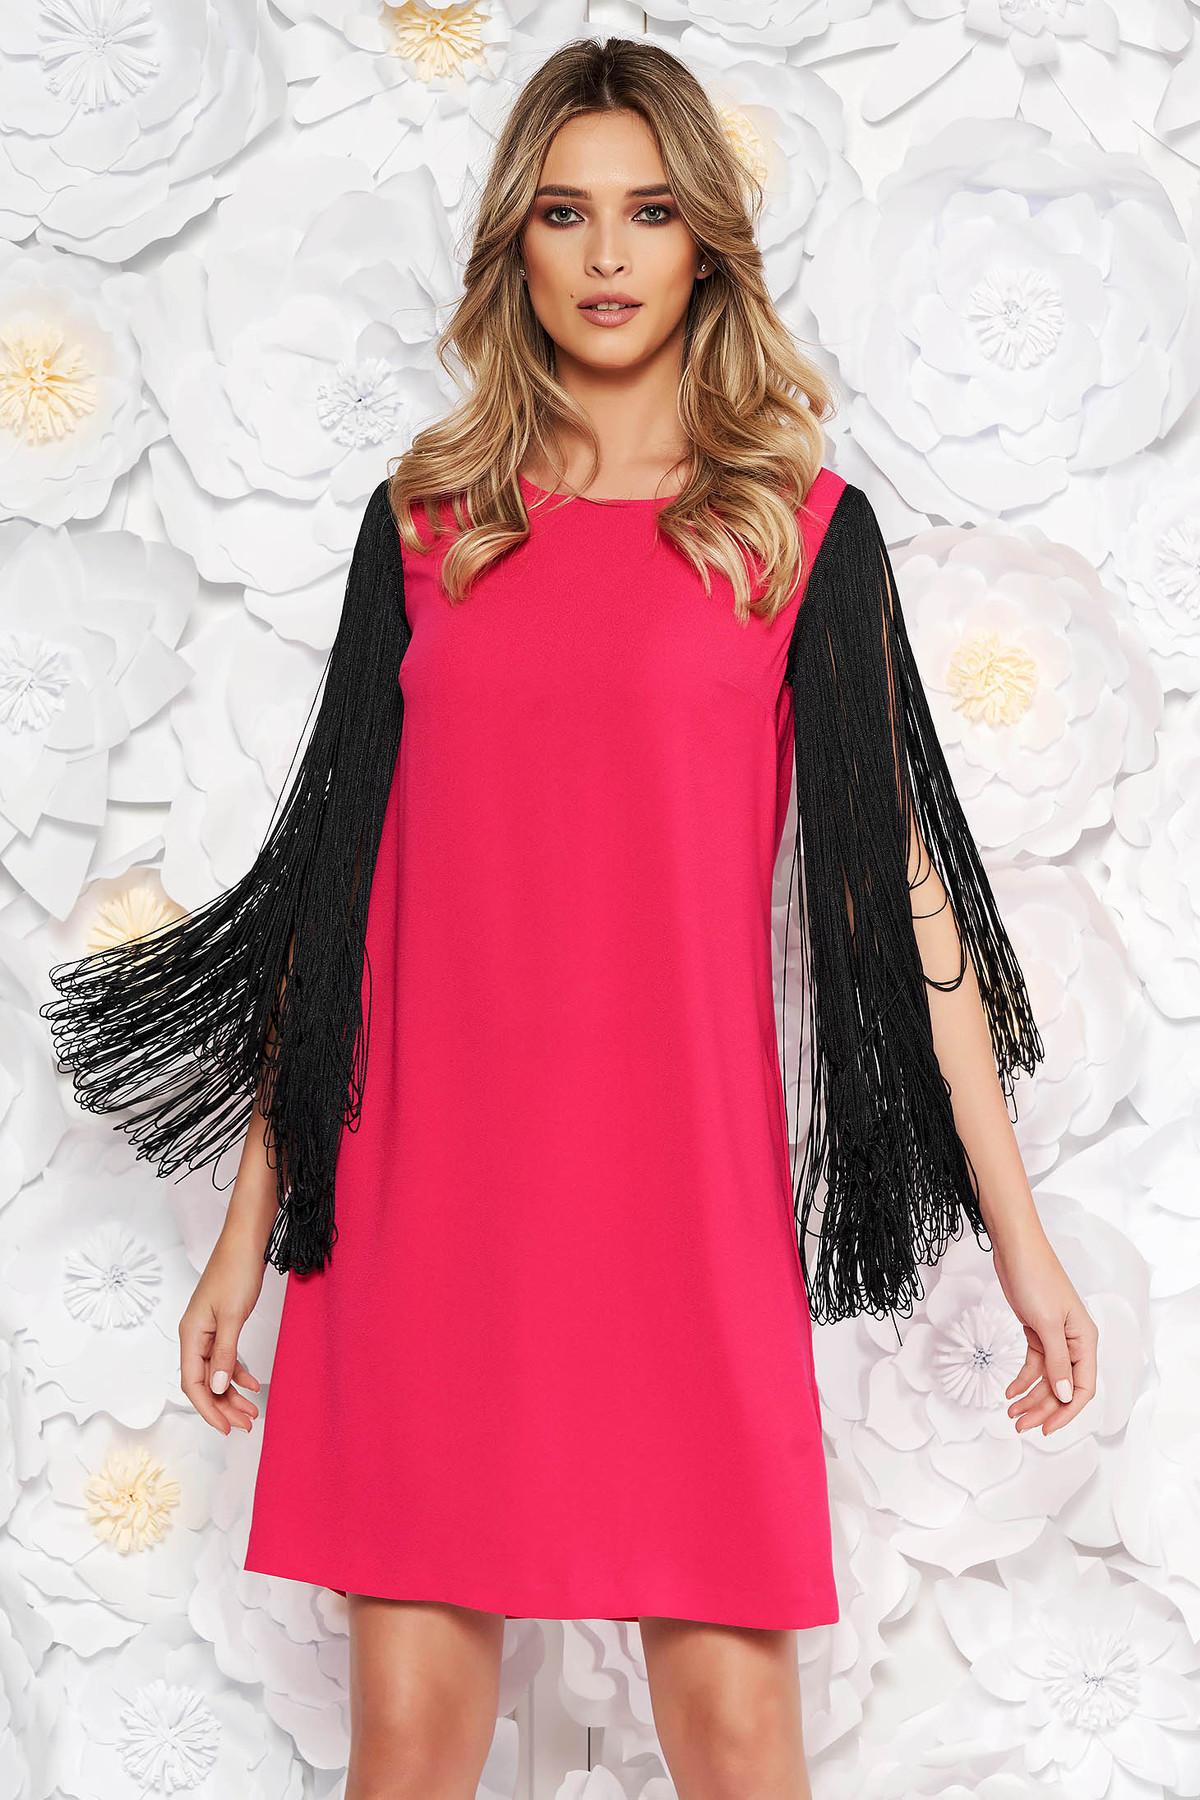 Rochie roz de ocazie din material neelastic cu croi larg si maneci din franjuri